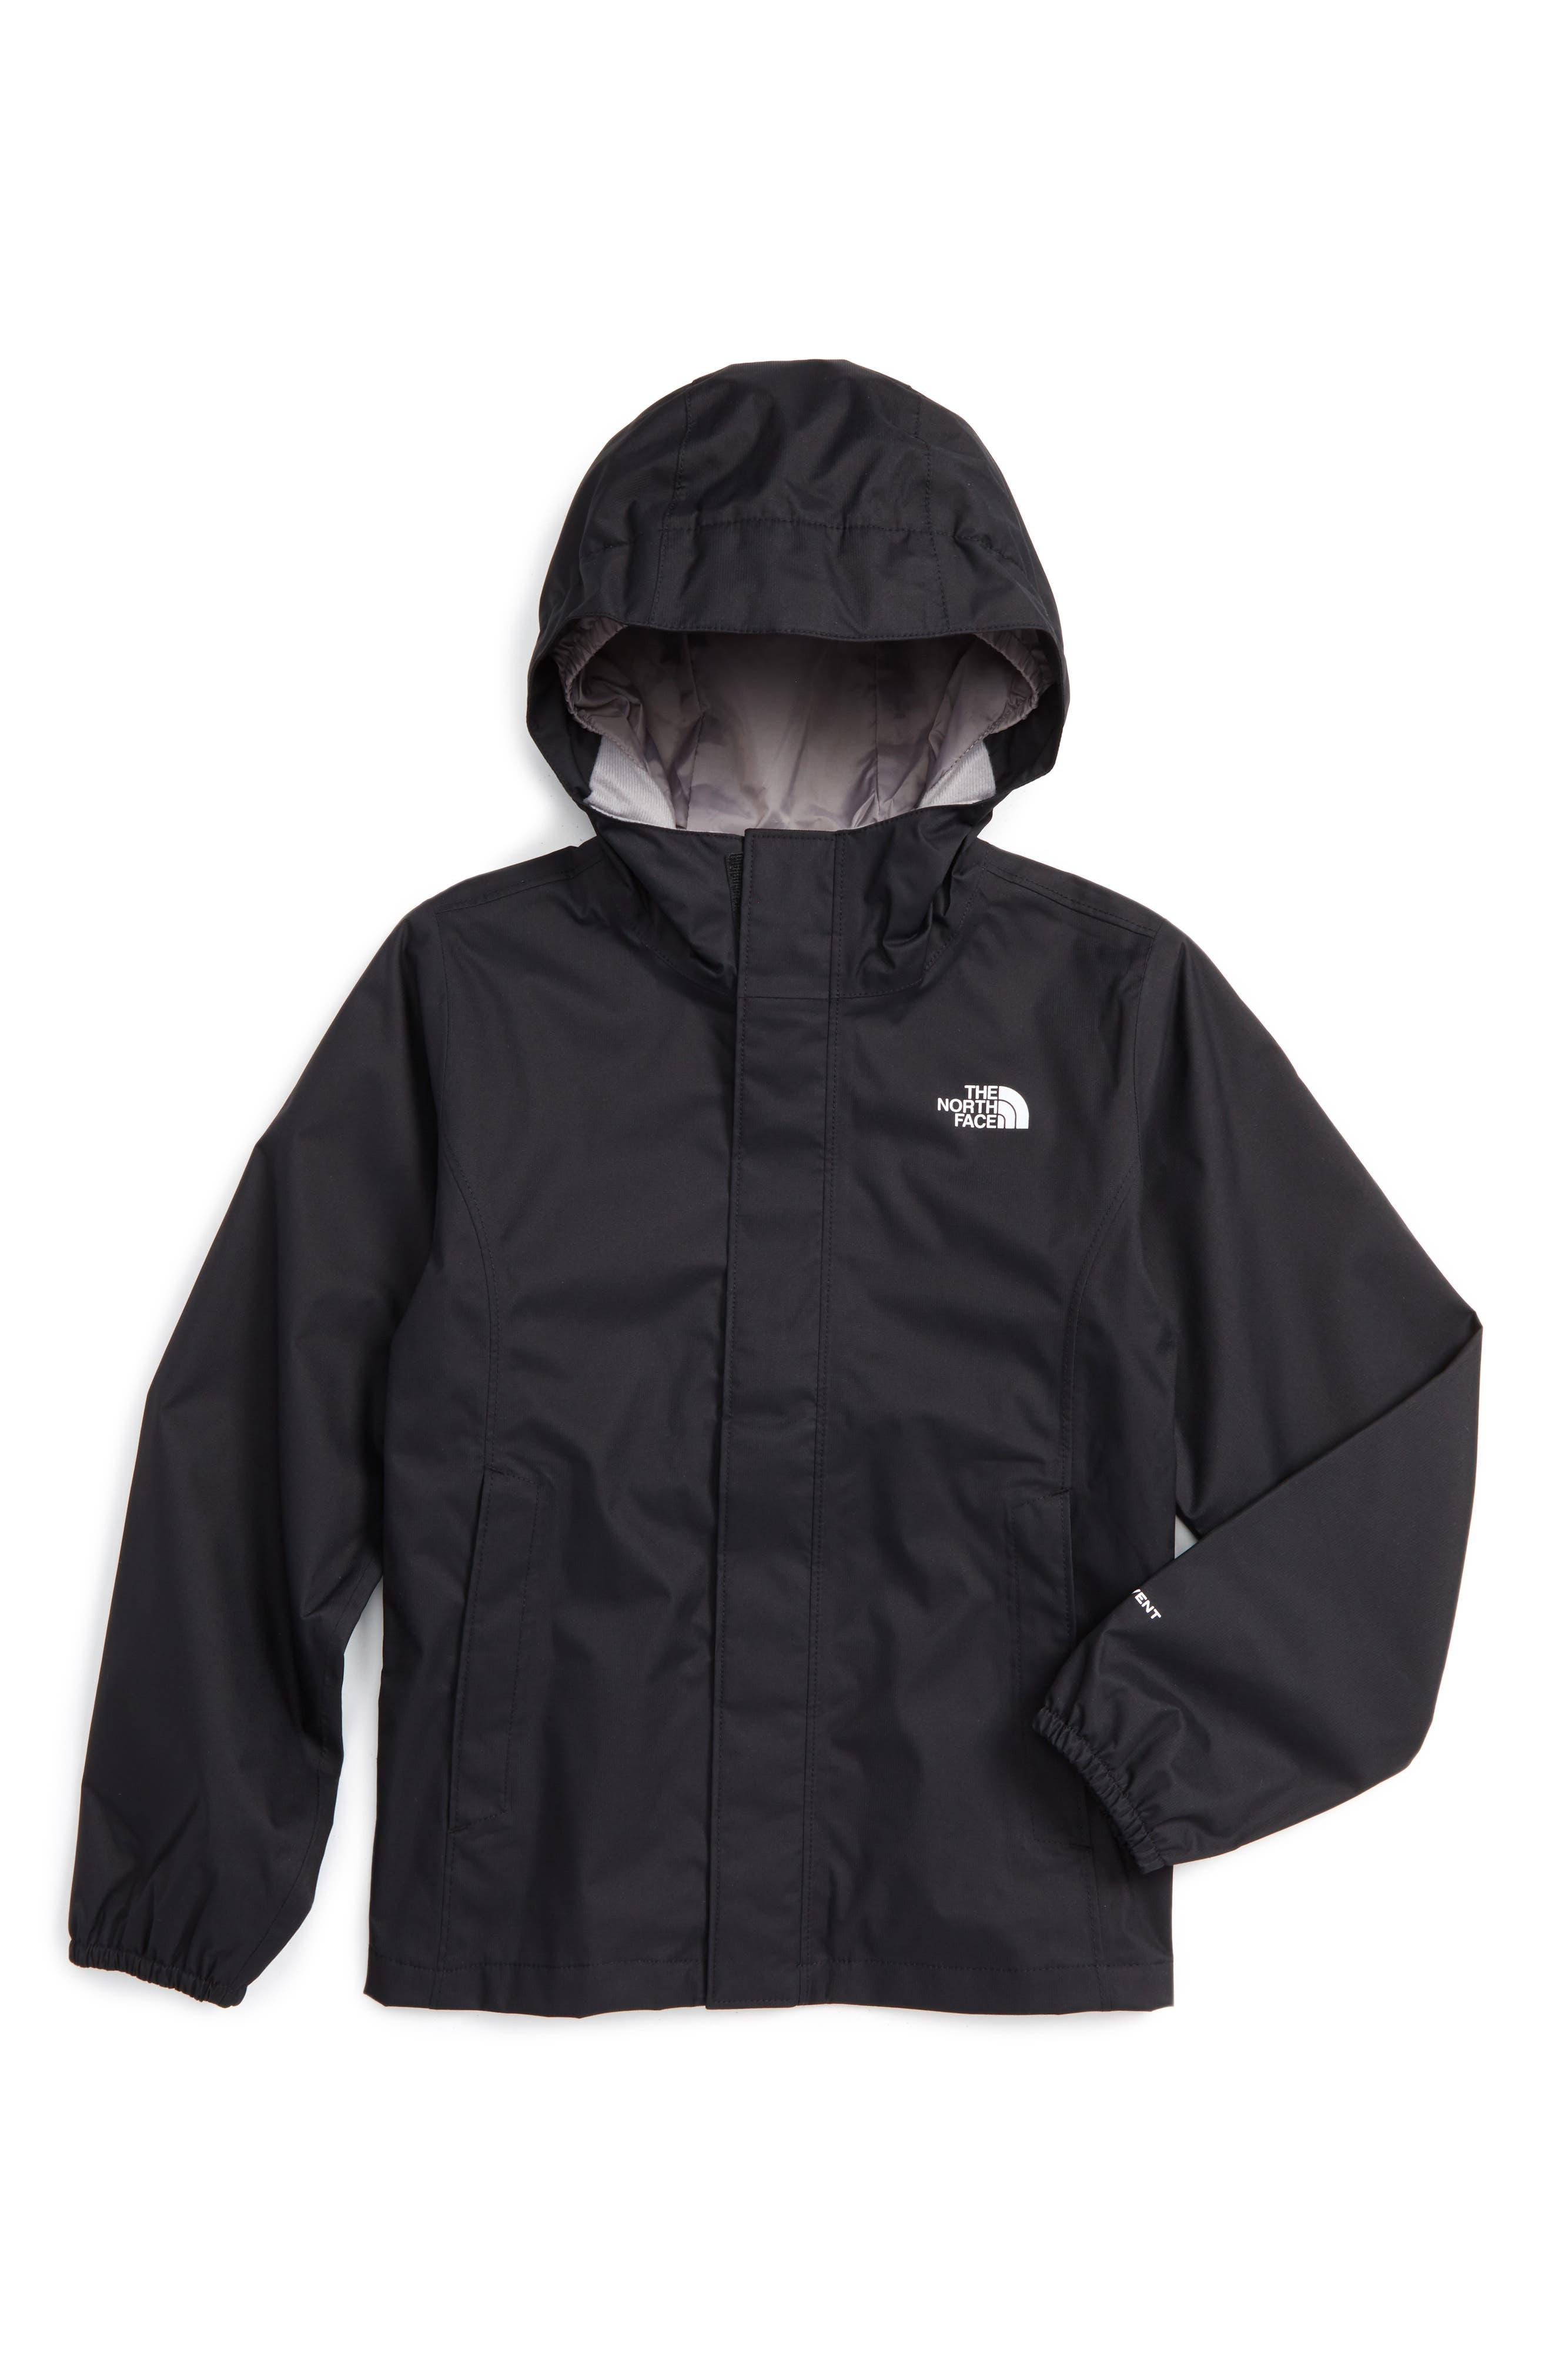 The North Face For Kids Girls Sizes 7 16 Nordstrom Jaket Fleece Silver Misty